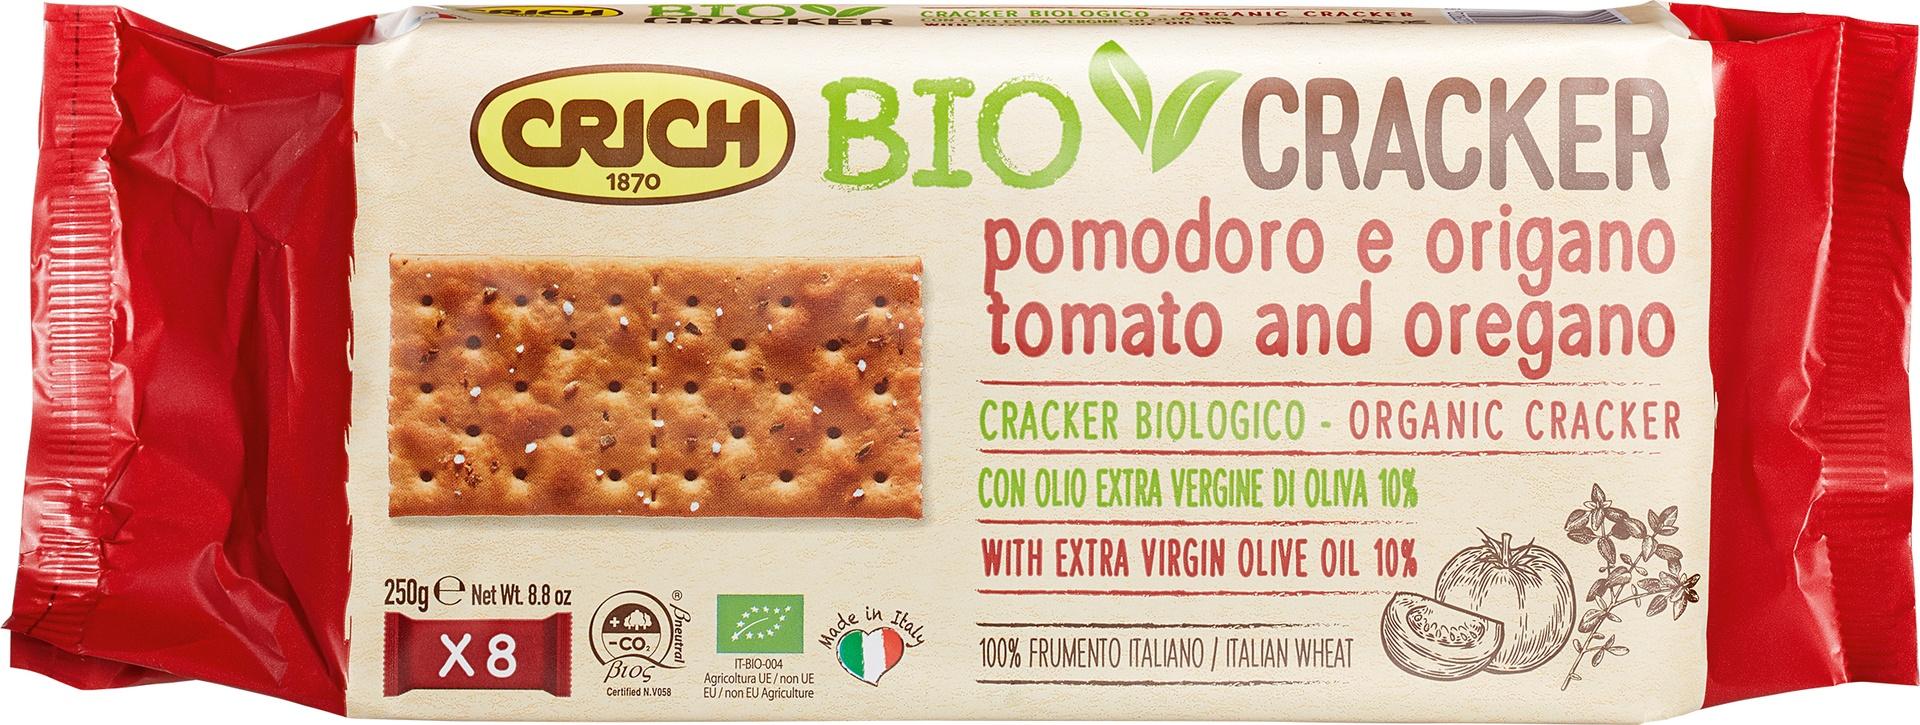 Biologische Crich BioCracker tomaat-oregano 250 gr